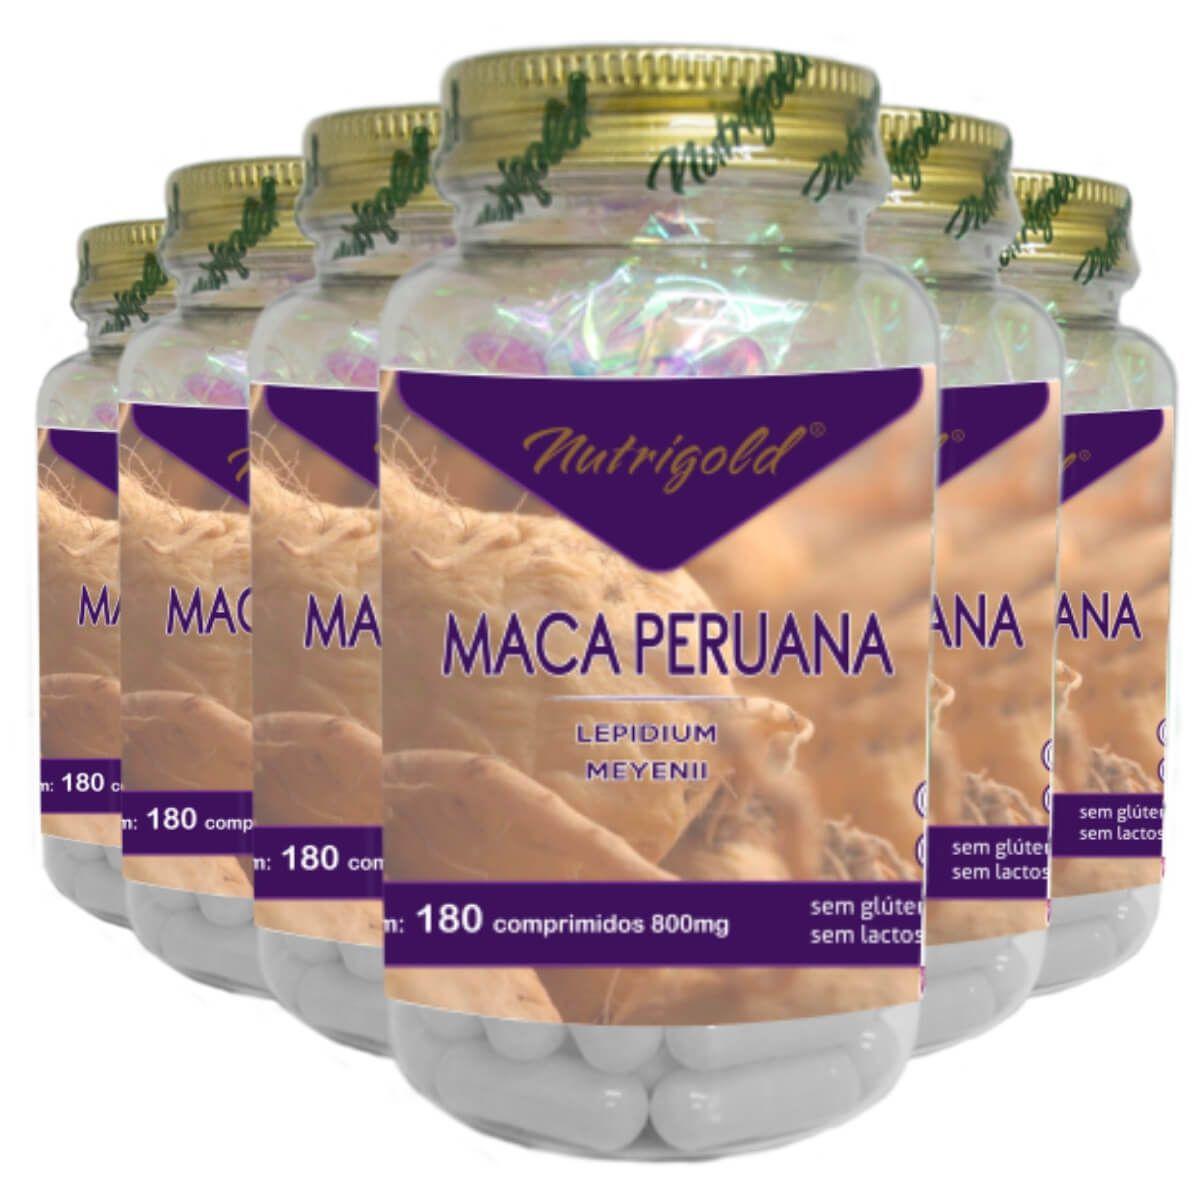 Kit 6 Maca Peruana 180 Comprimidos 800mg